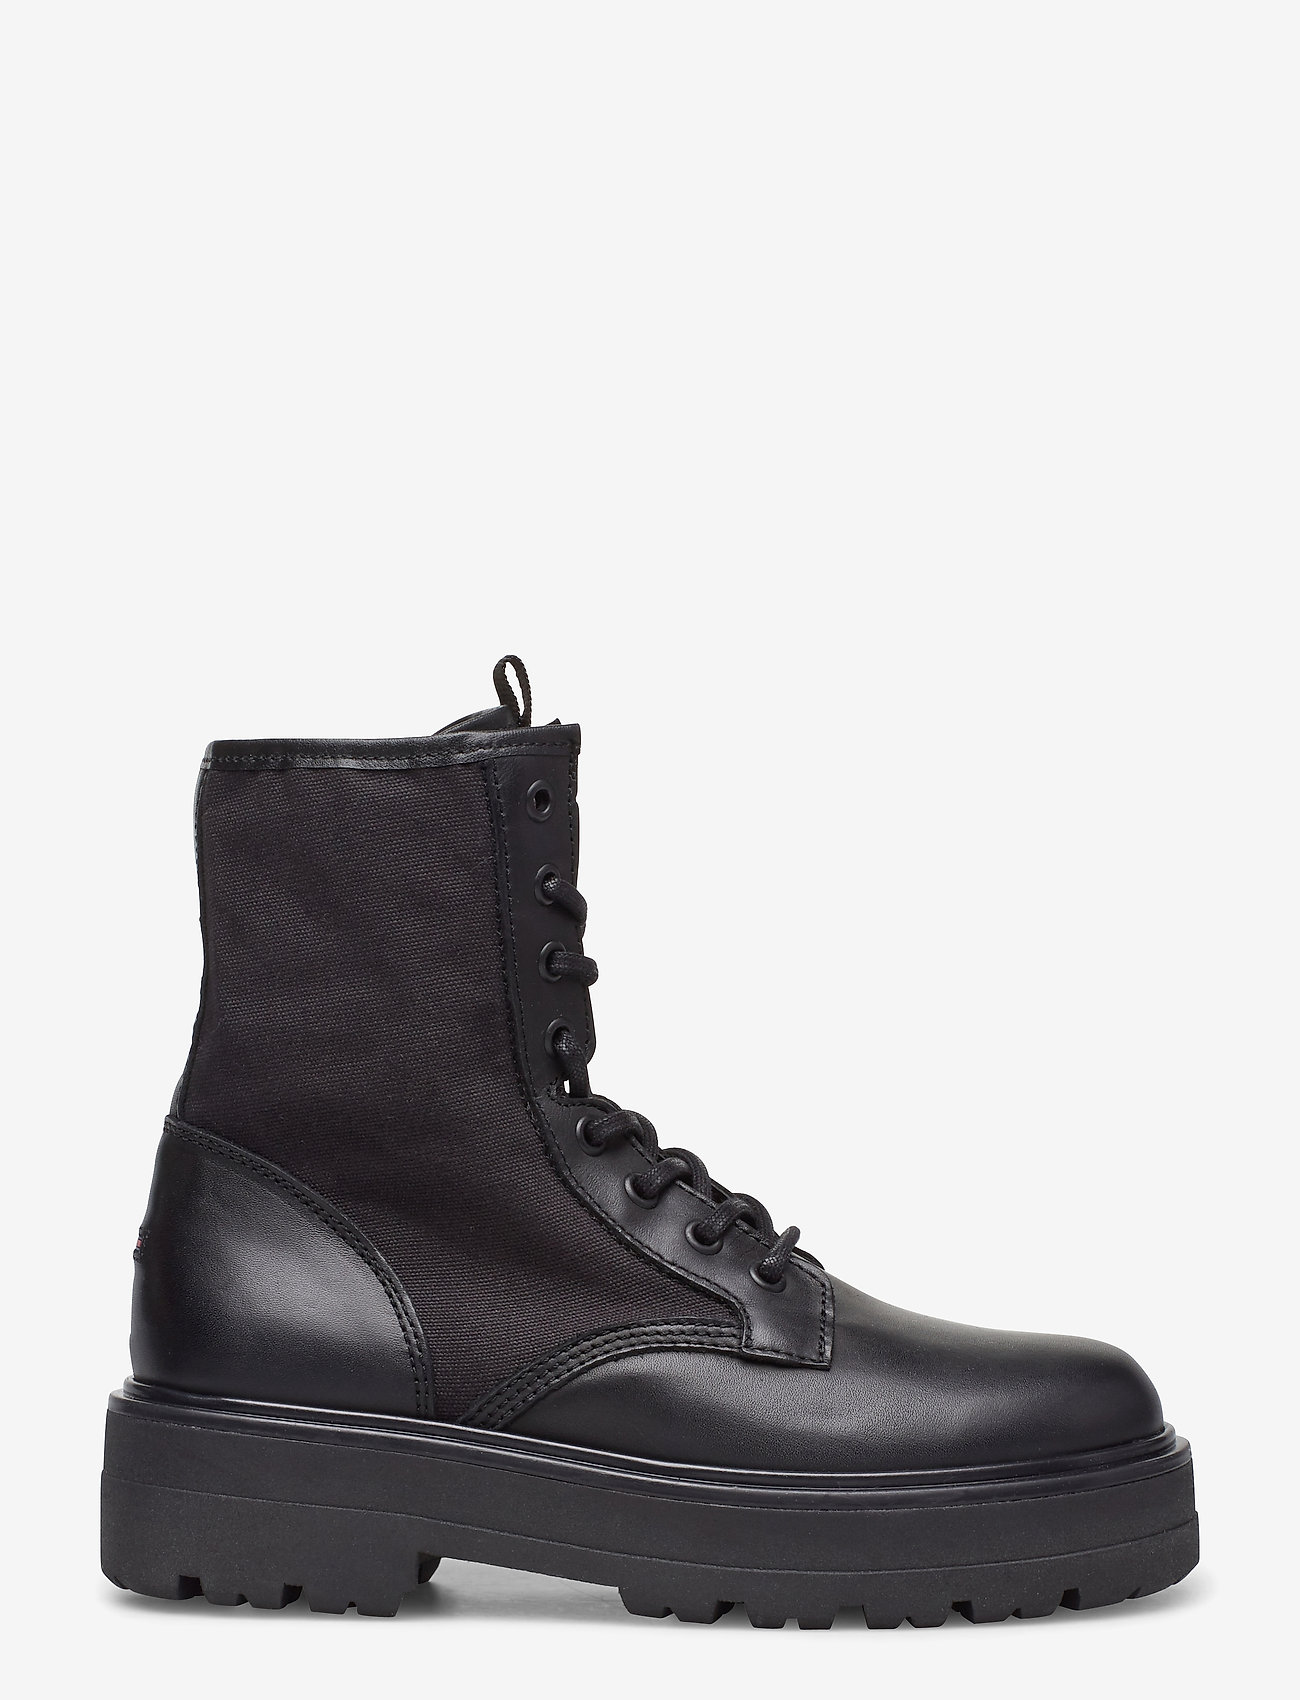 Tommy Hilfiger - TOMMY JEANS FLATFORM BOOT - flat ankle boots - black - 1